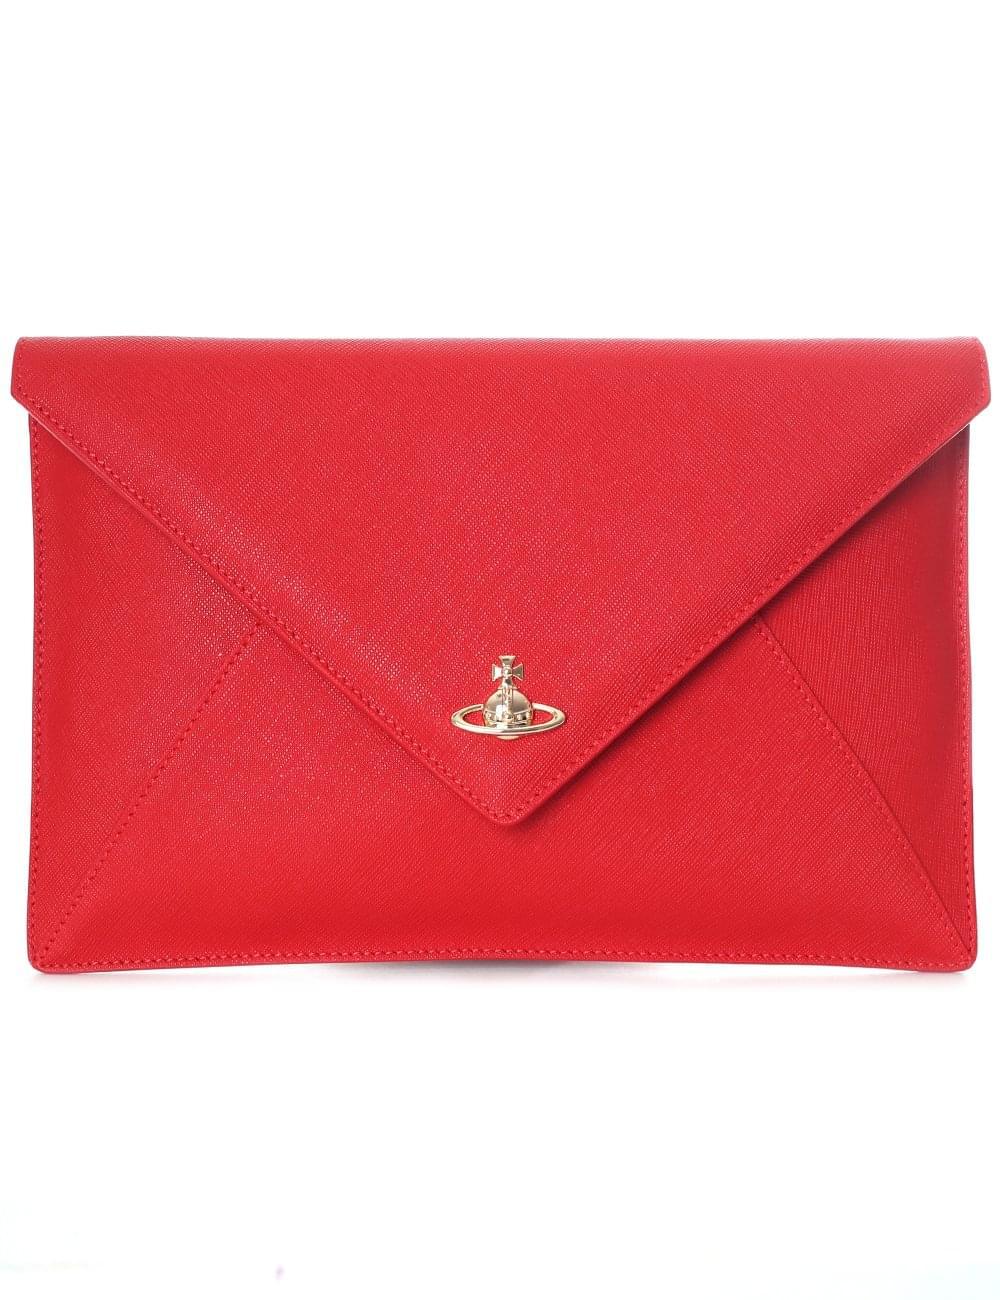 fbaedc412f5f Vivienne Westwood Women s Saff Envelope Clutch